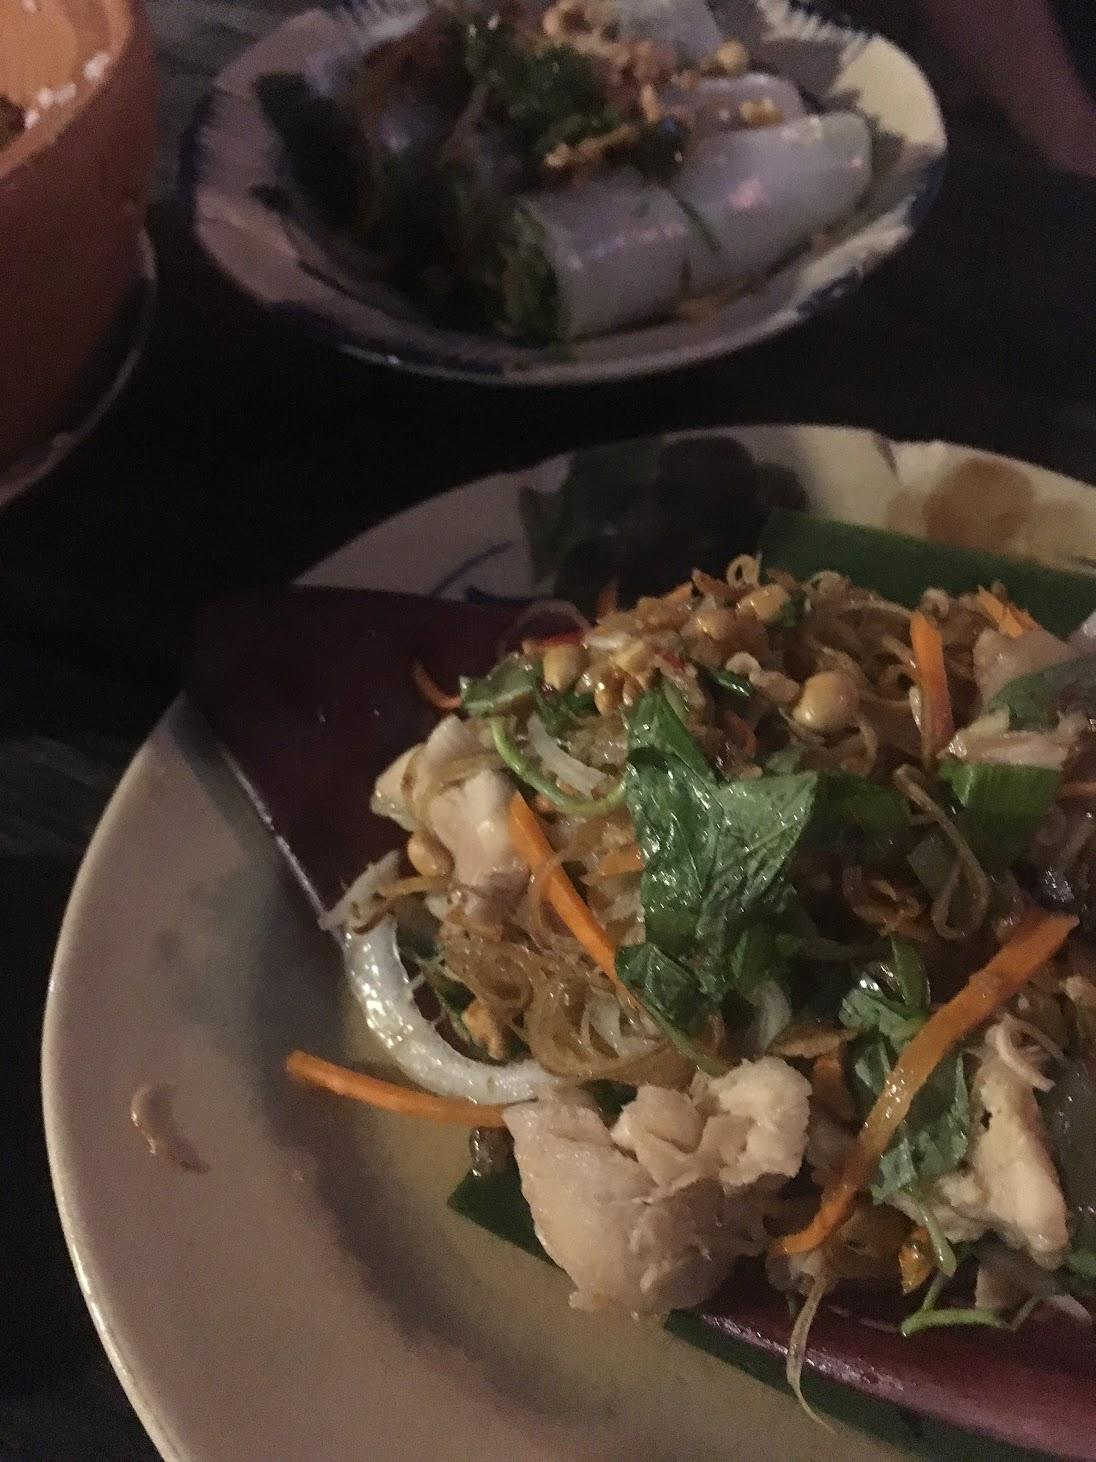 Mountain Retreat - Banana Leaf & chicken salad